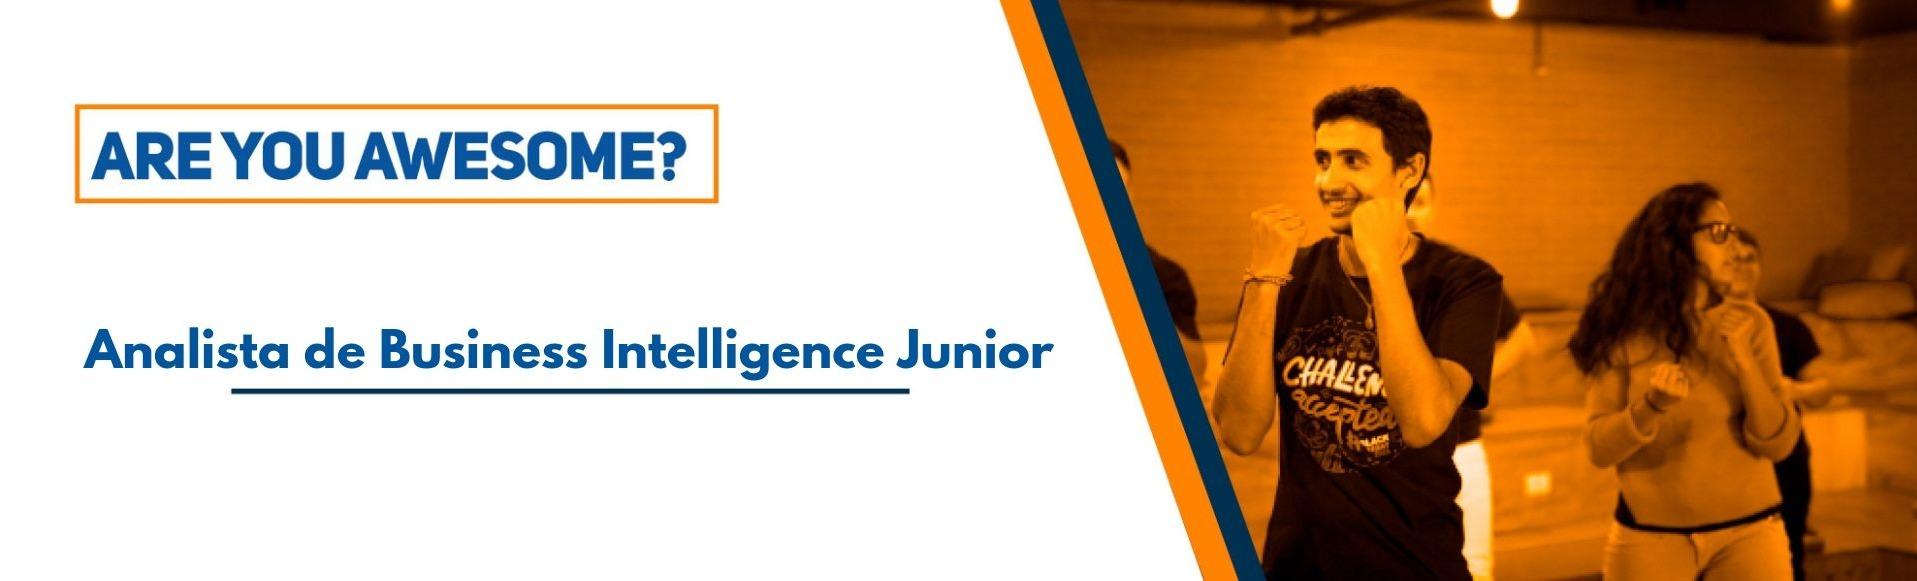 Analista de Business Intelligence Junior